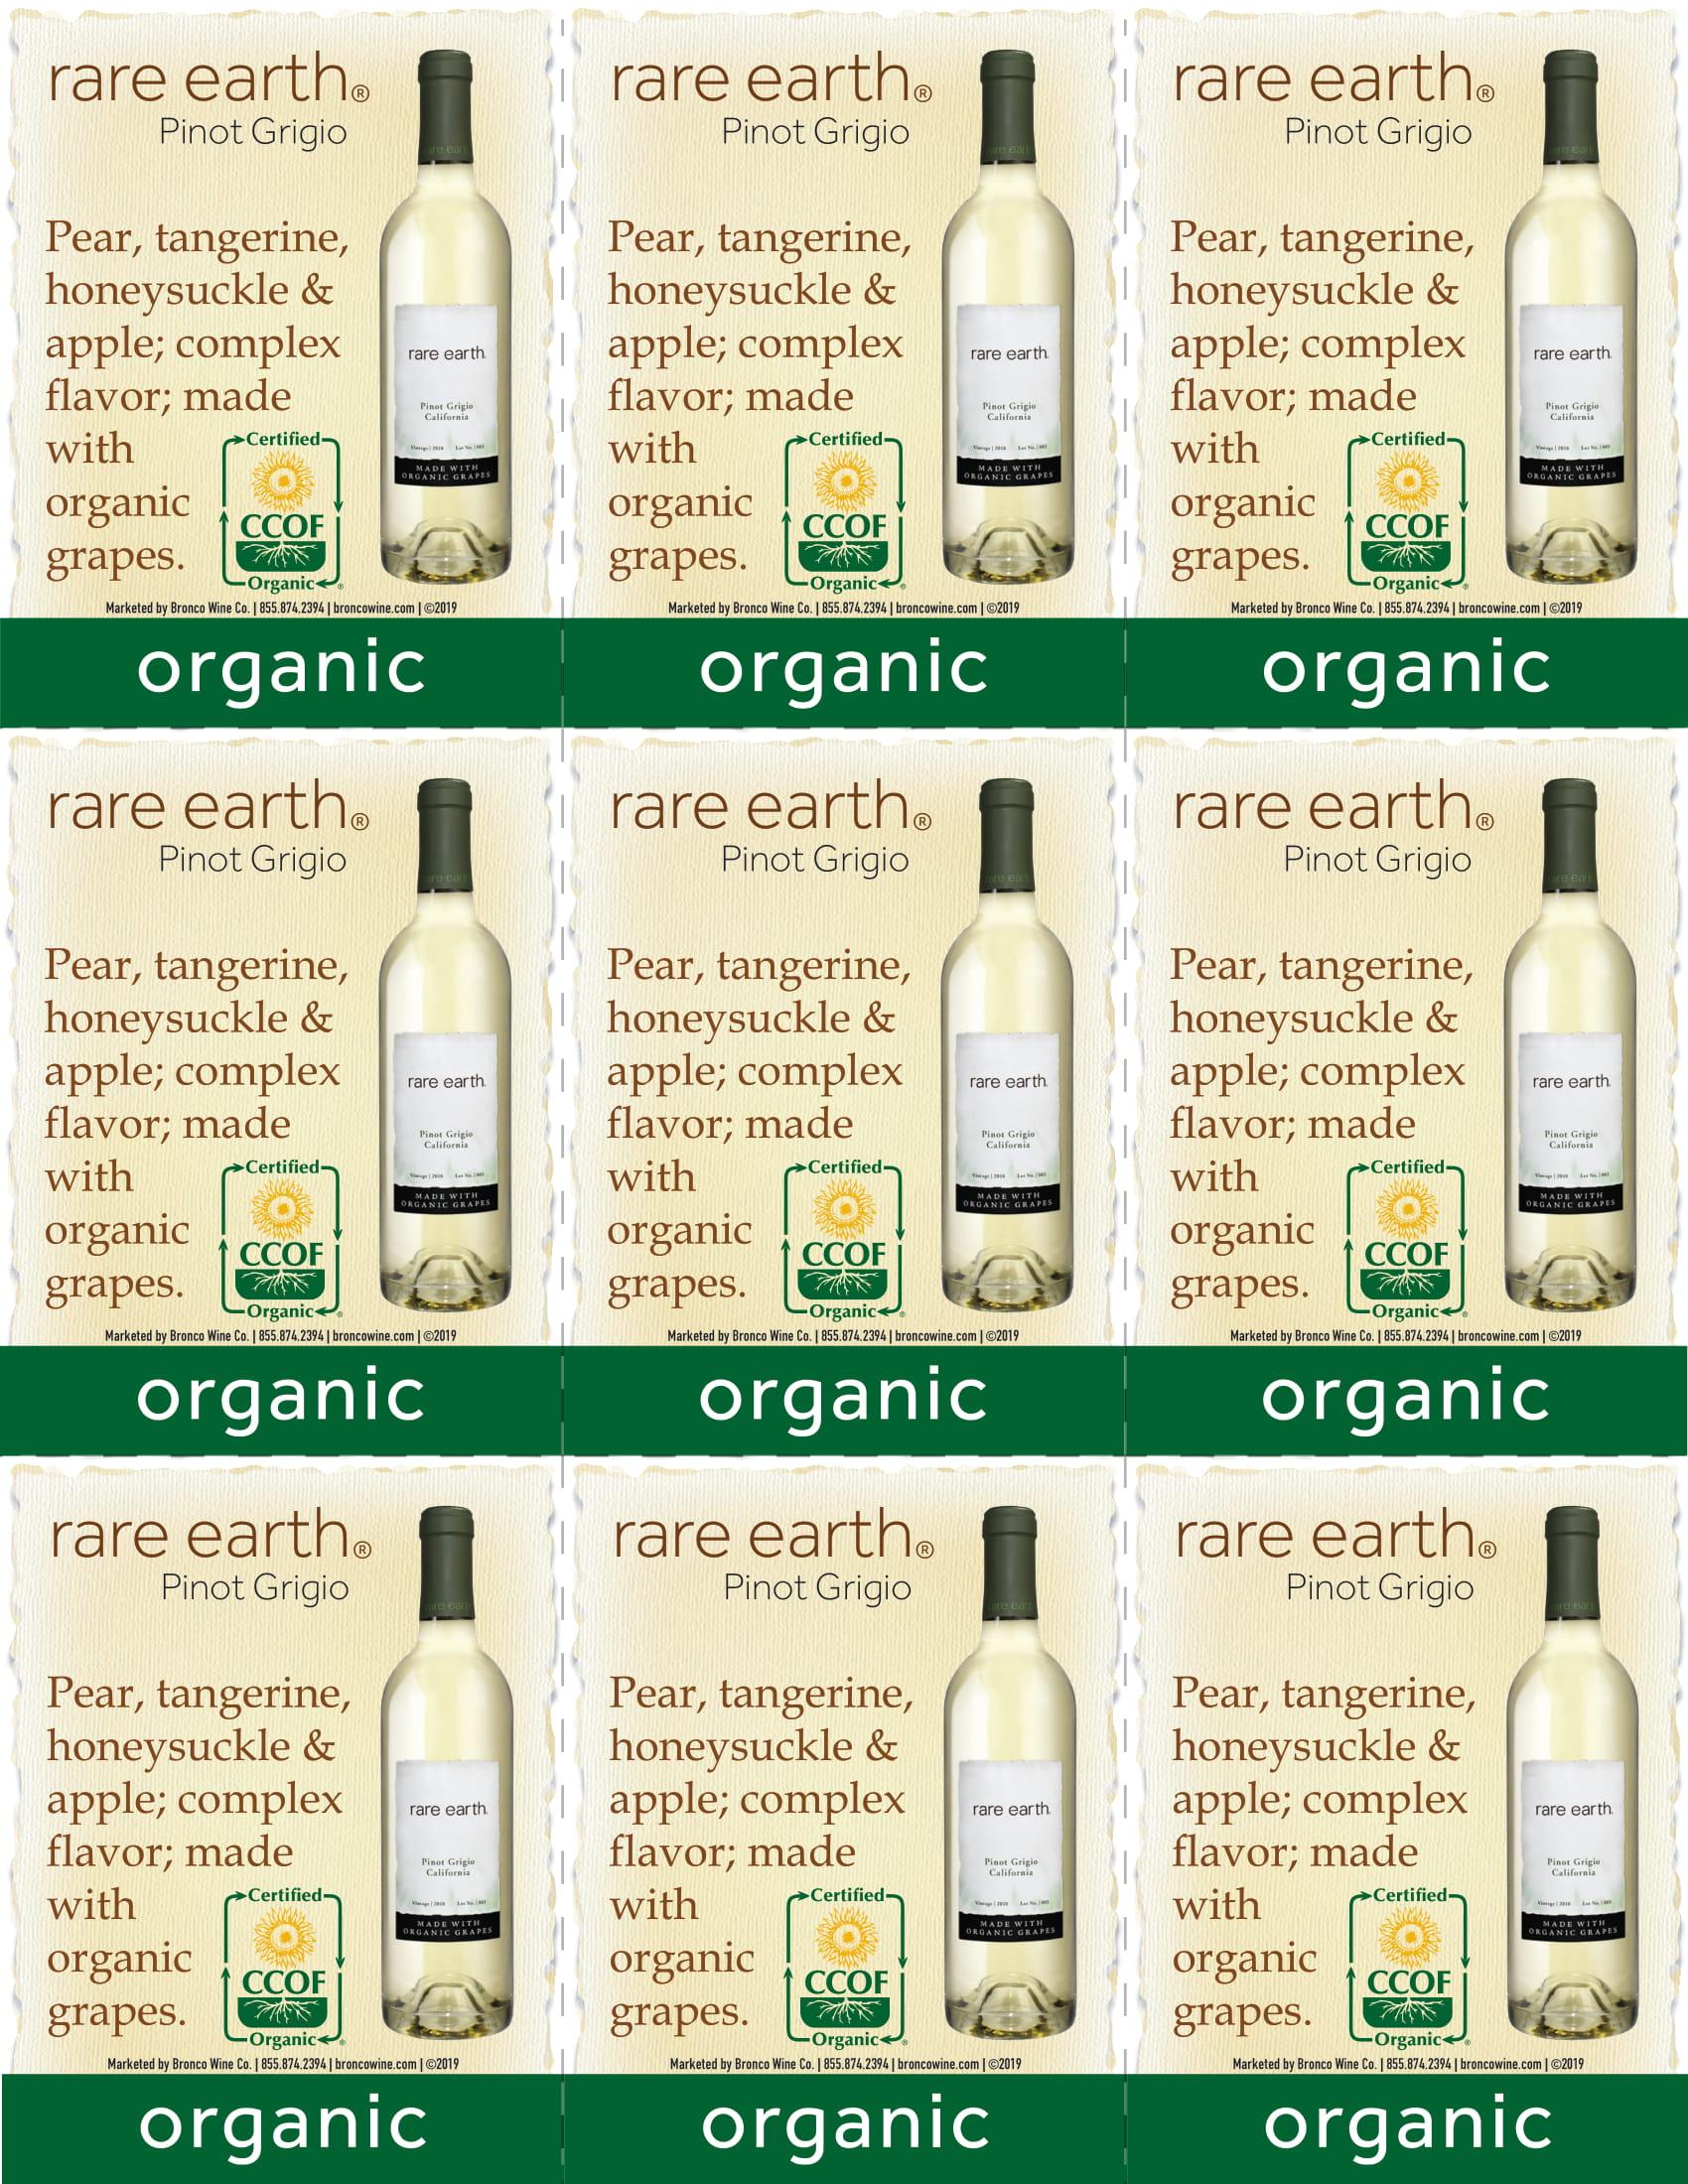 Rare Earth Pinot Grigio Shelf Talker